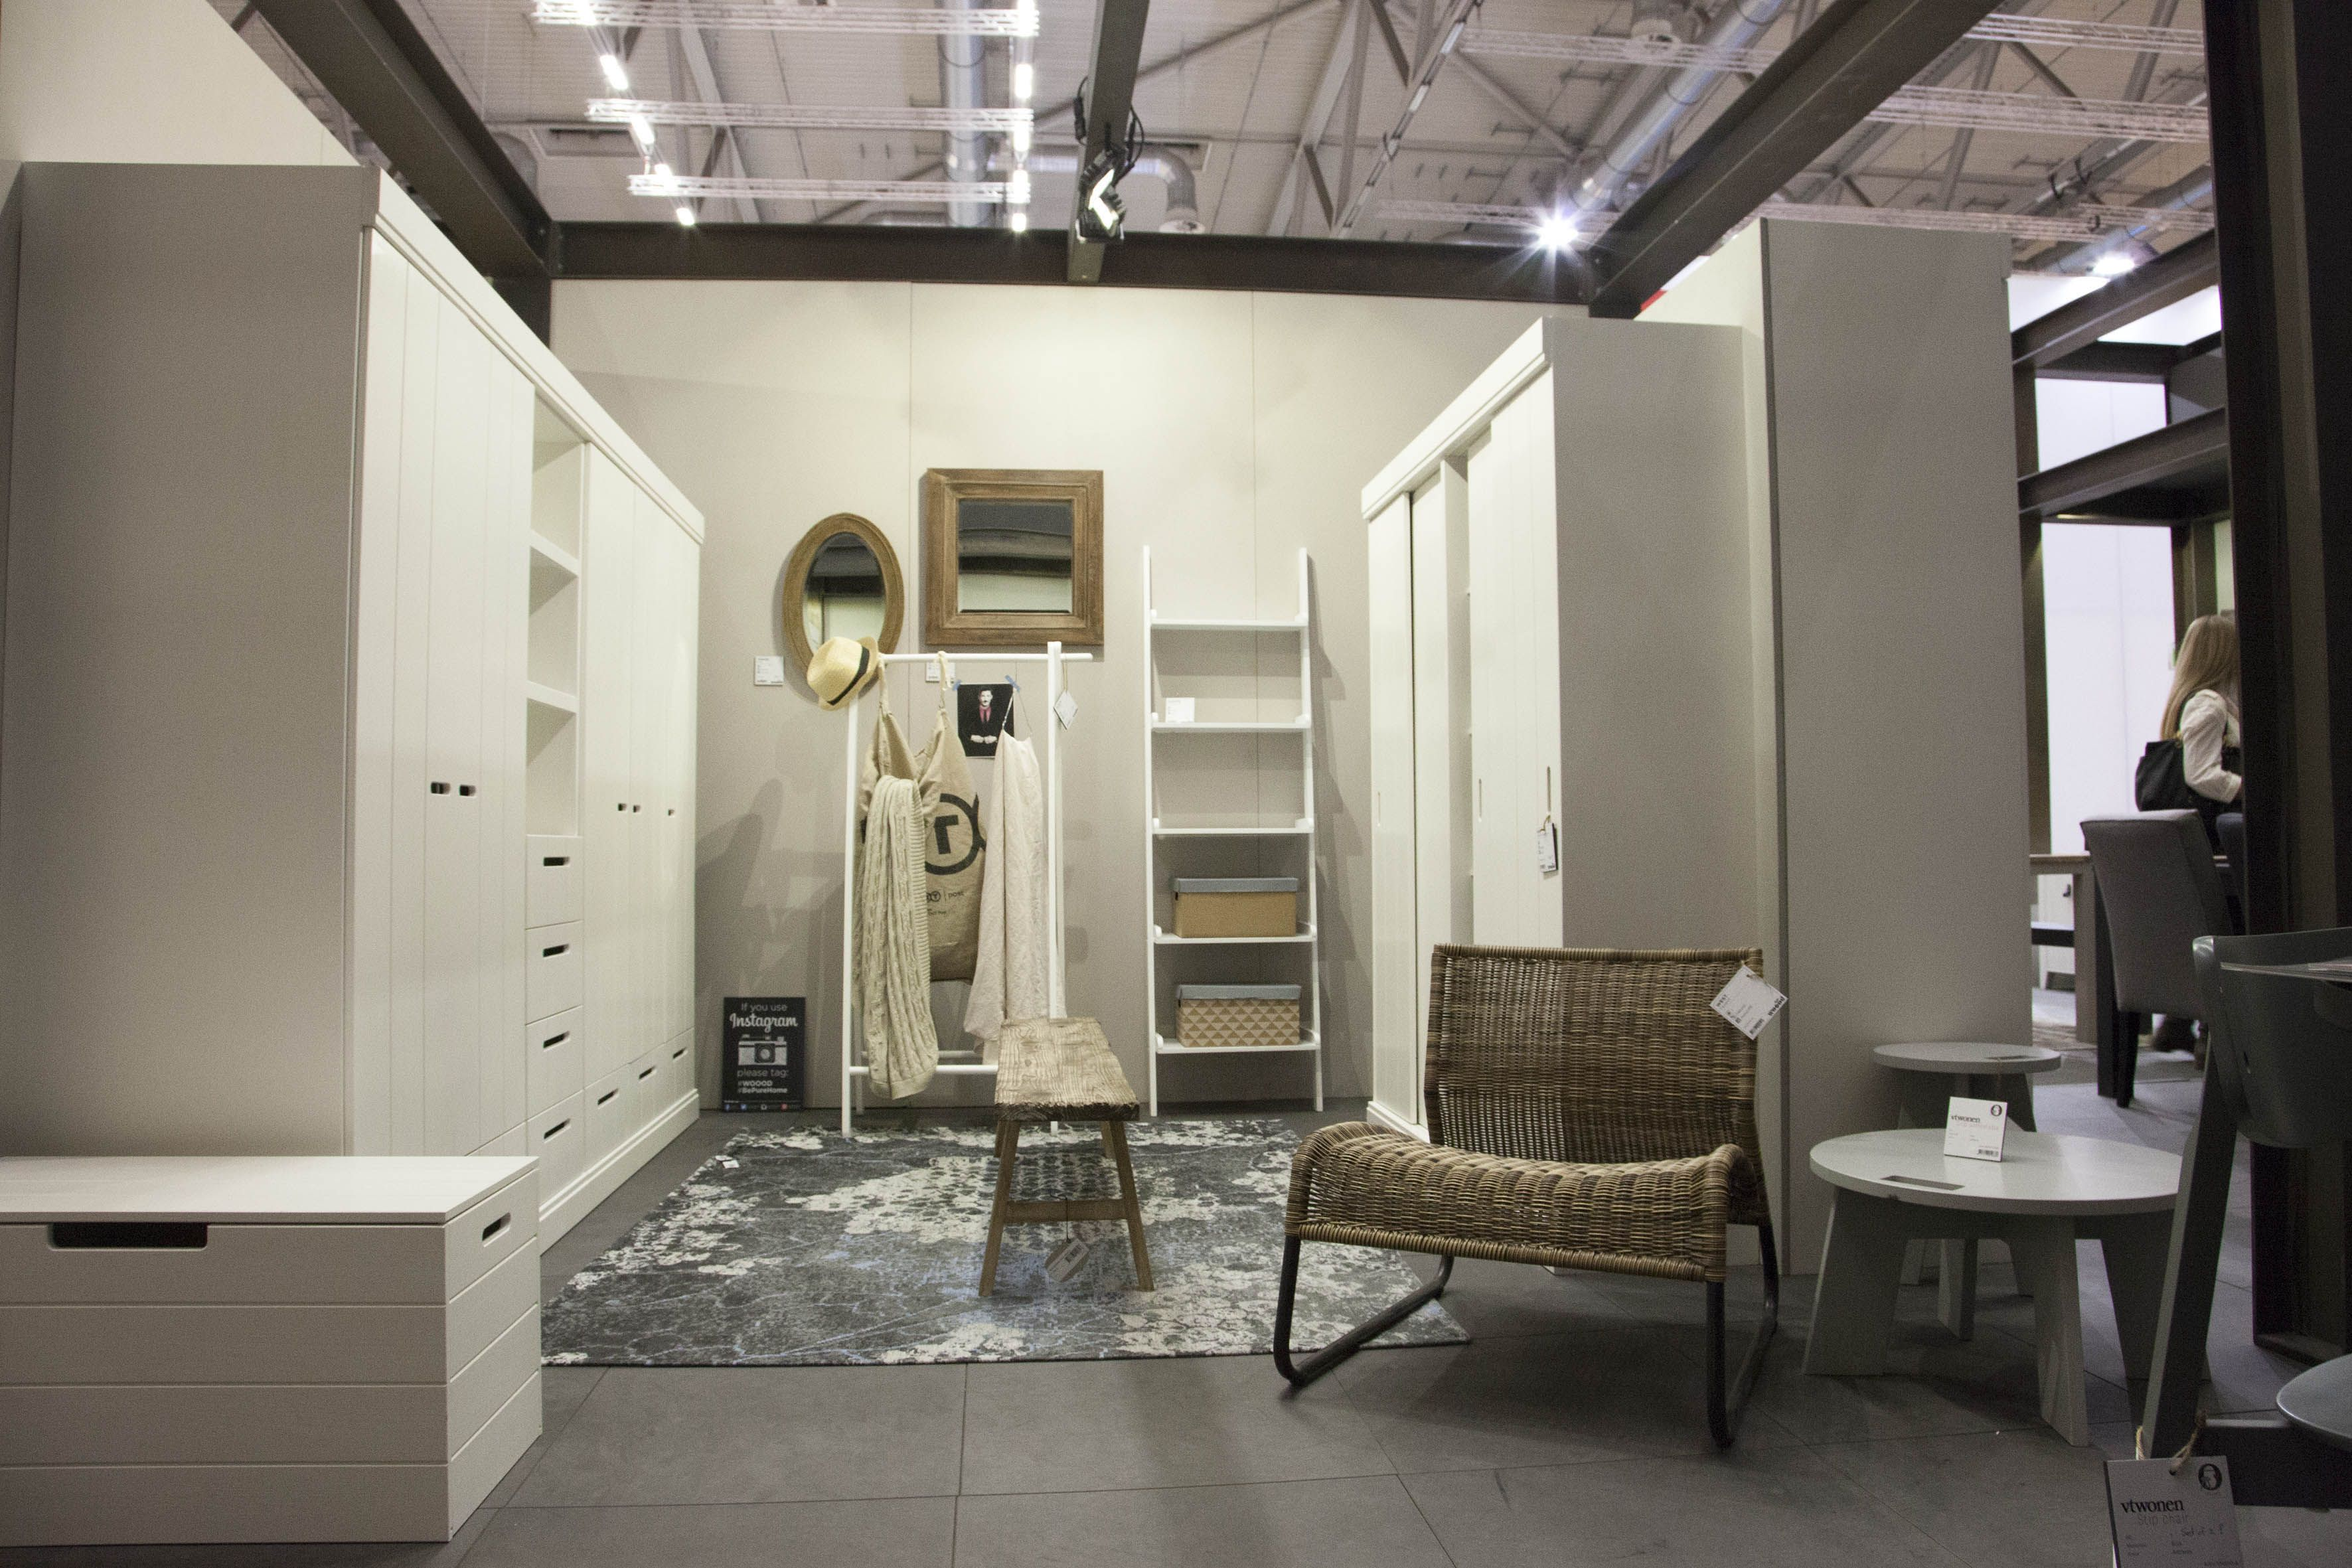 Cabinet CONNECT, Row, clothing rack Plunje, wall shelf Schoor - WOOOD. Kasten, armoires, Schränke. Kledingrek, penderie, Kleiderständer. #immcologne #imm2015